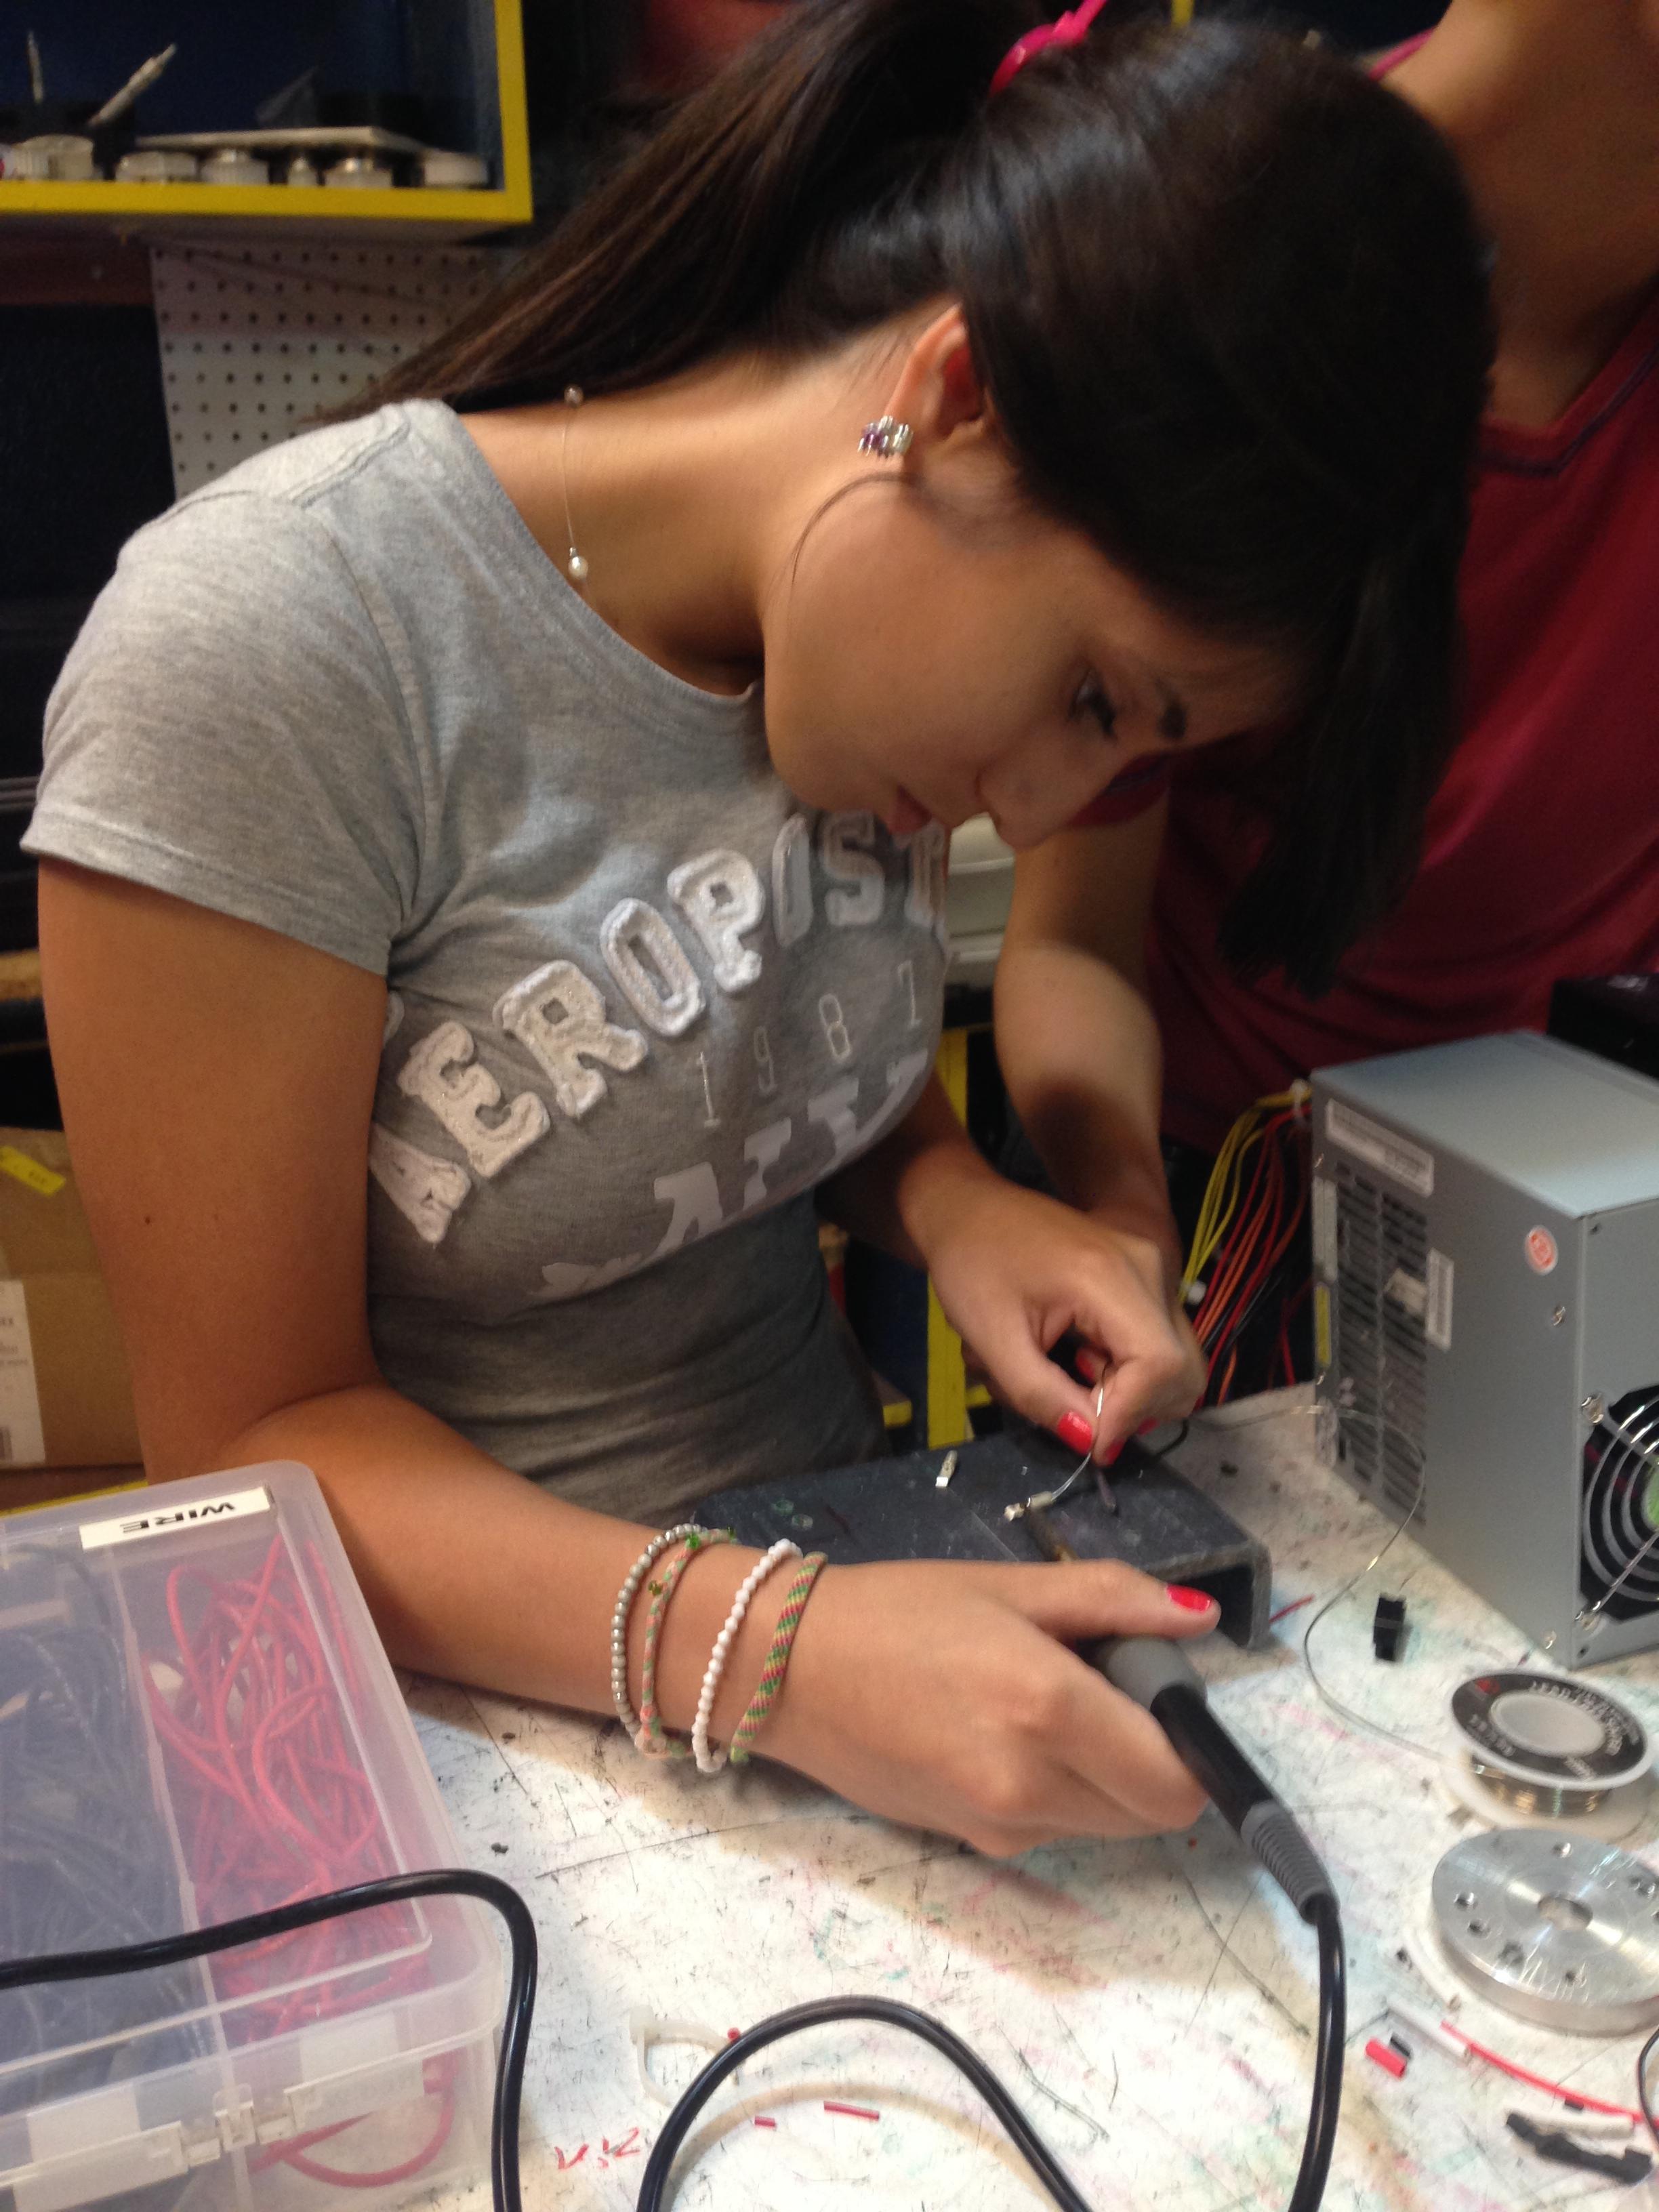 Caption: Dianna Valenzuela working on a robot., Credit: Valeria Fernandez / Radio Bilingüe